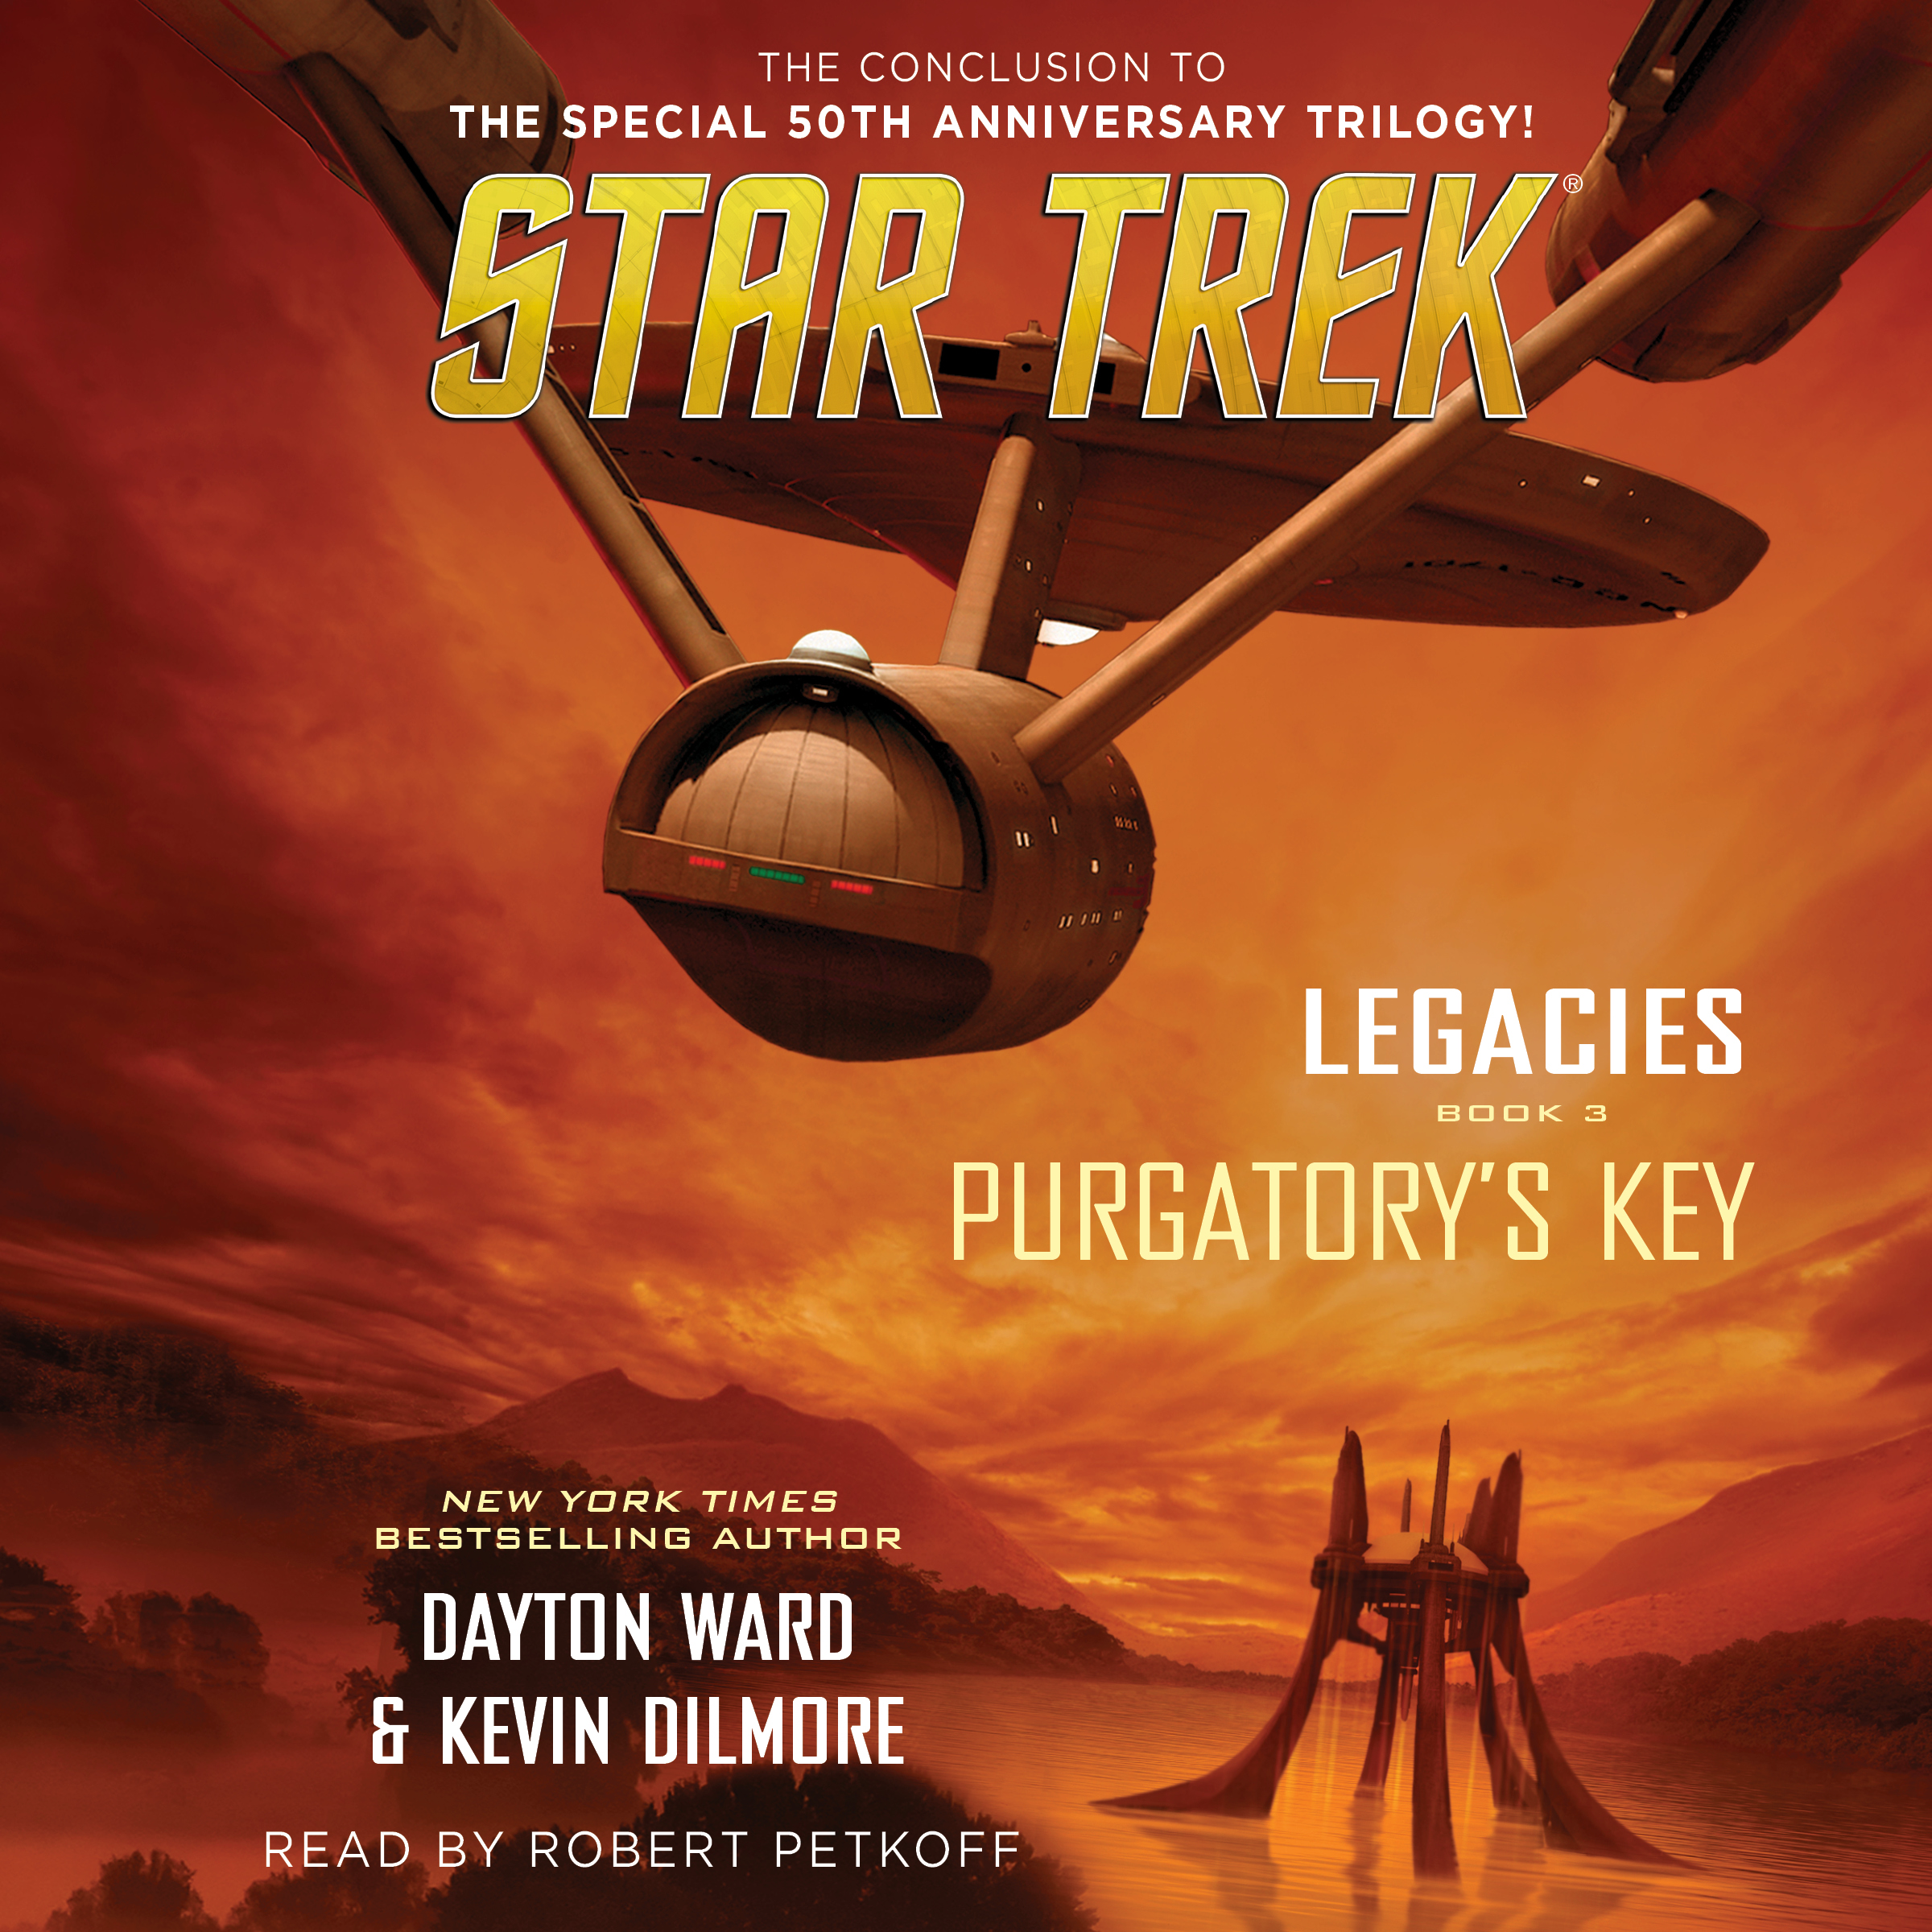 Legacies book 3 purgatorys key 9781508227021 hr